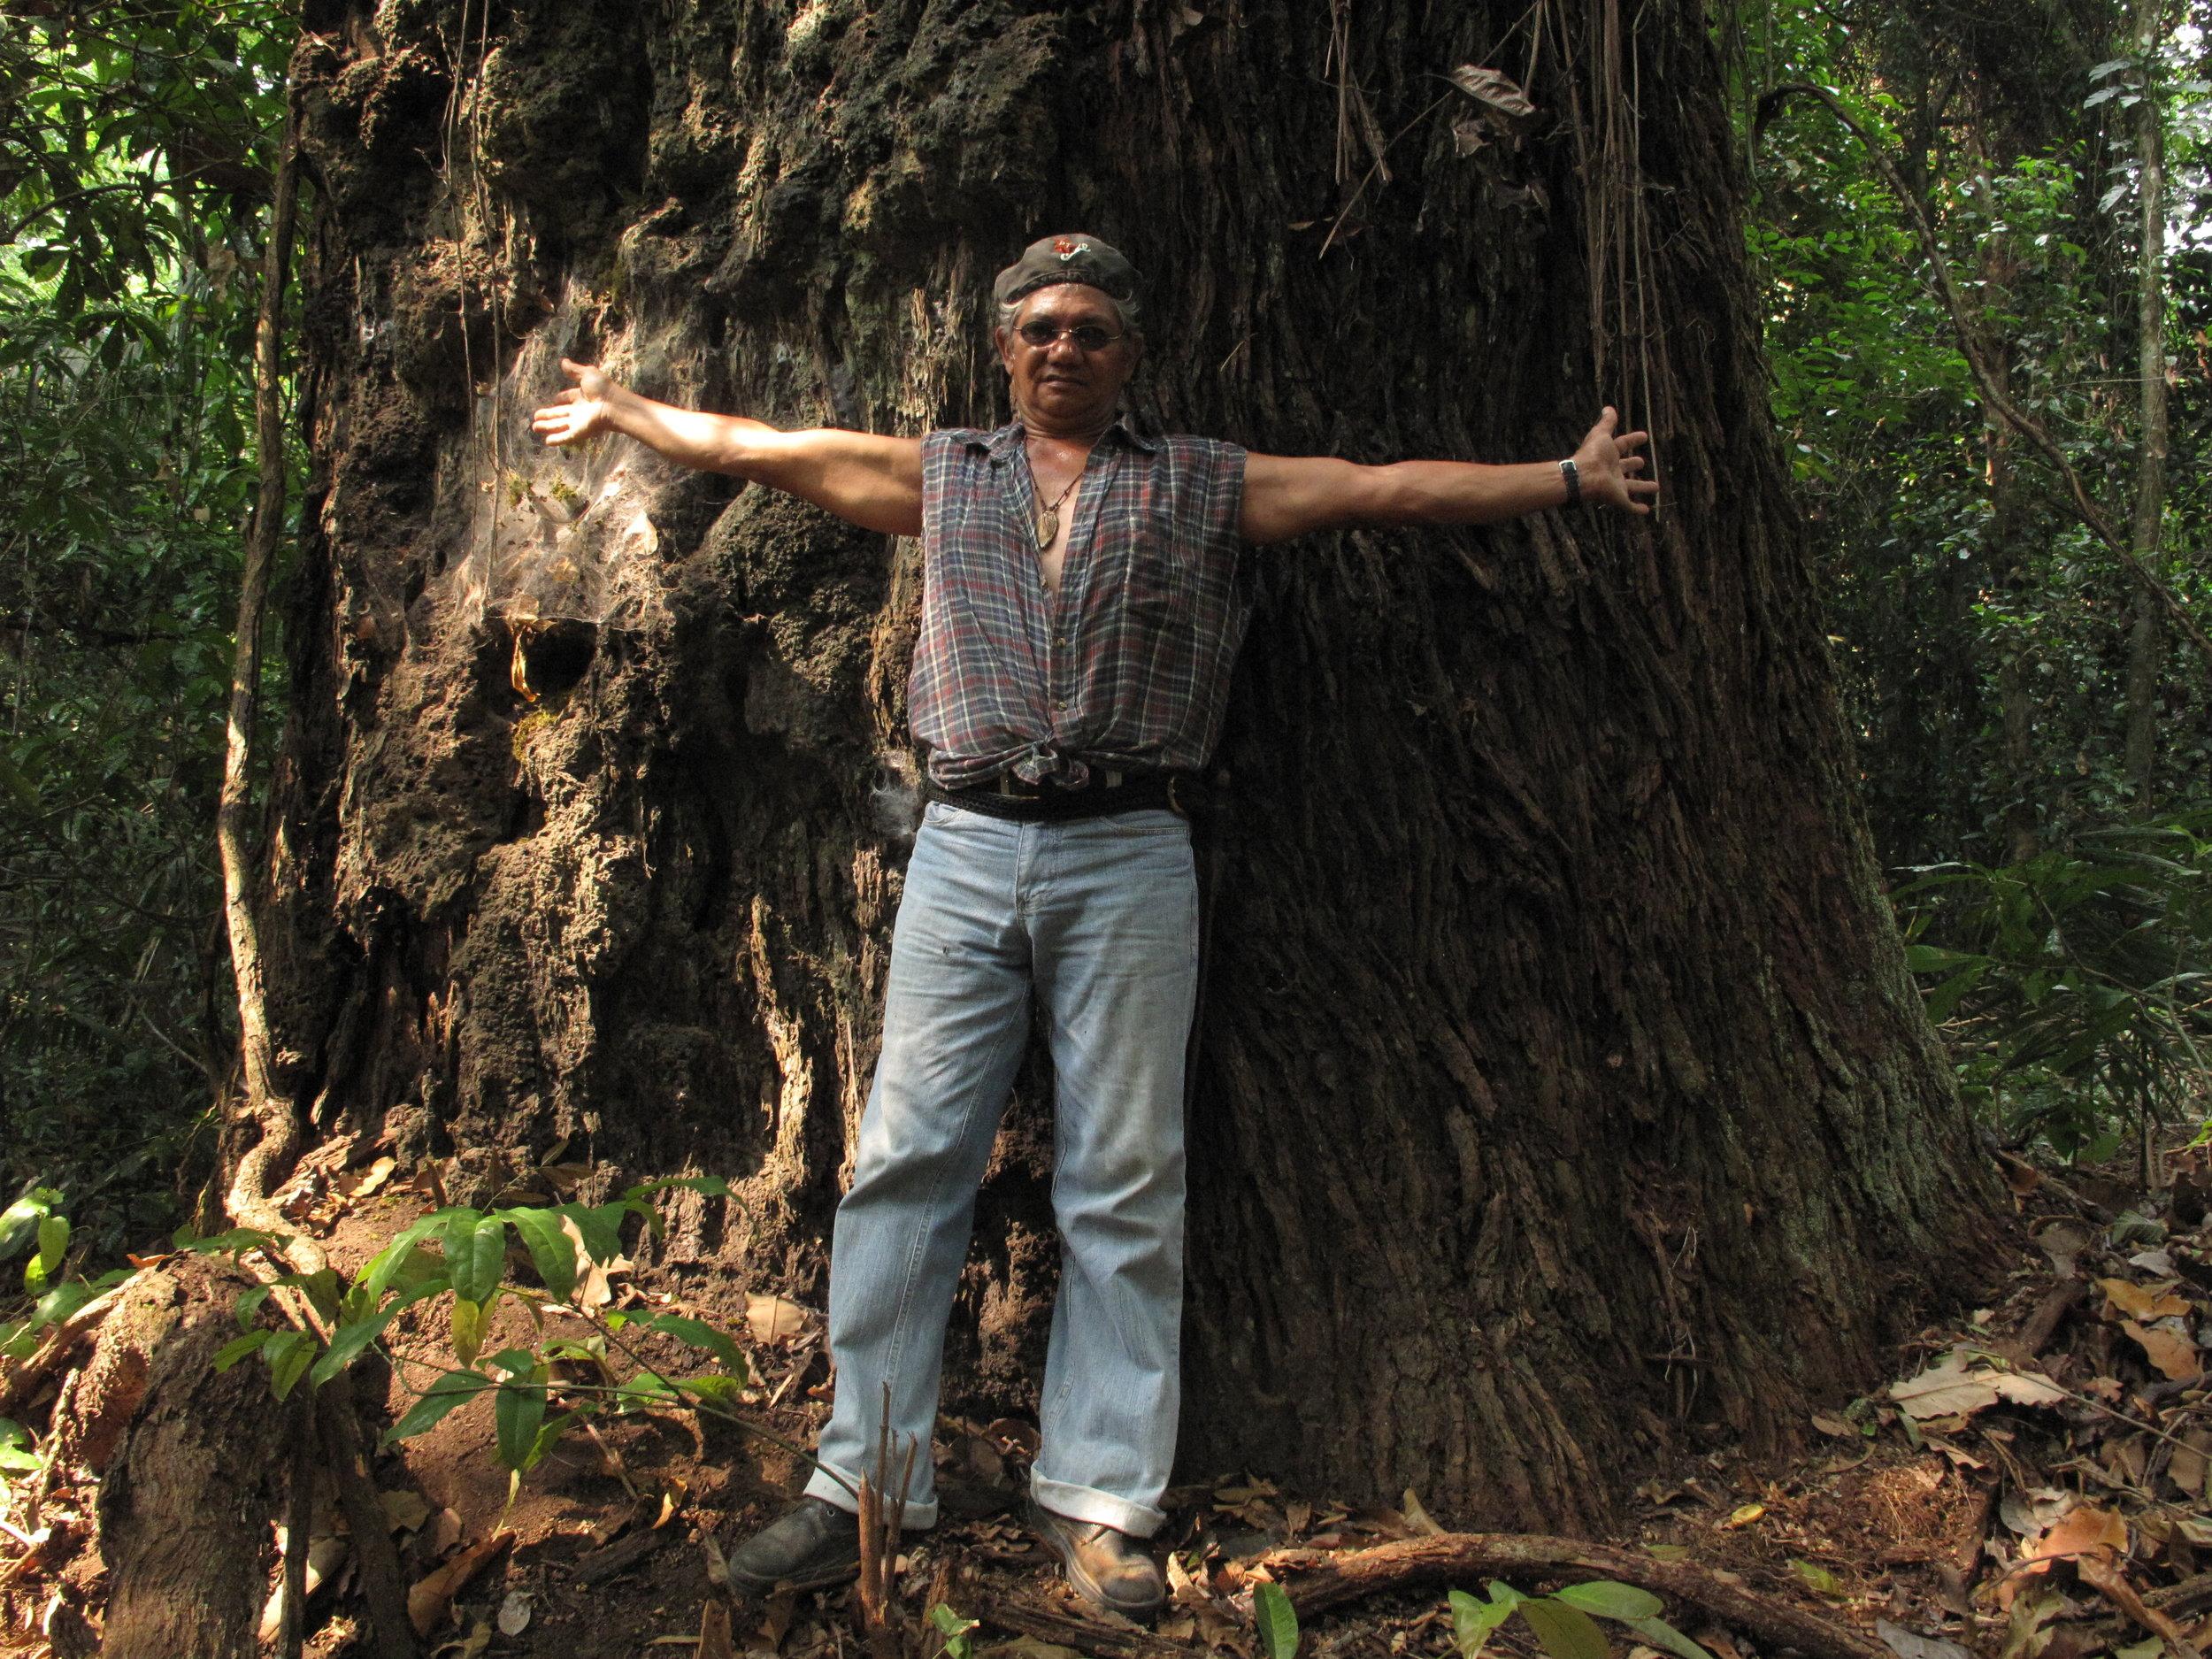 The Guardian - 448 'Dead Friends of the Earth' in Brazil since 2002